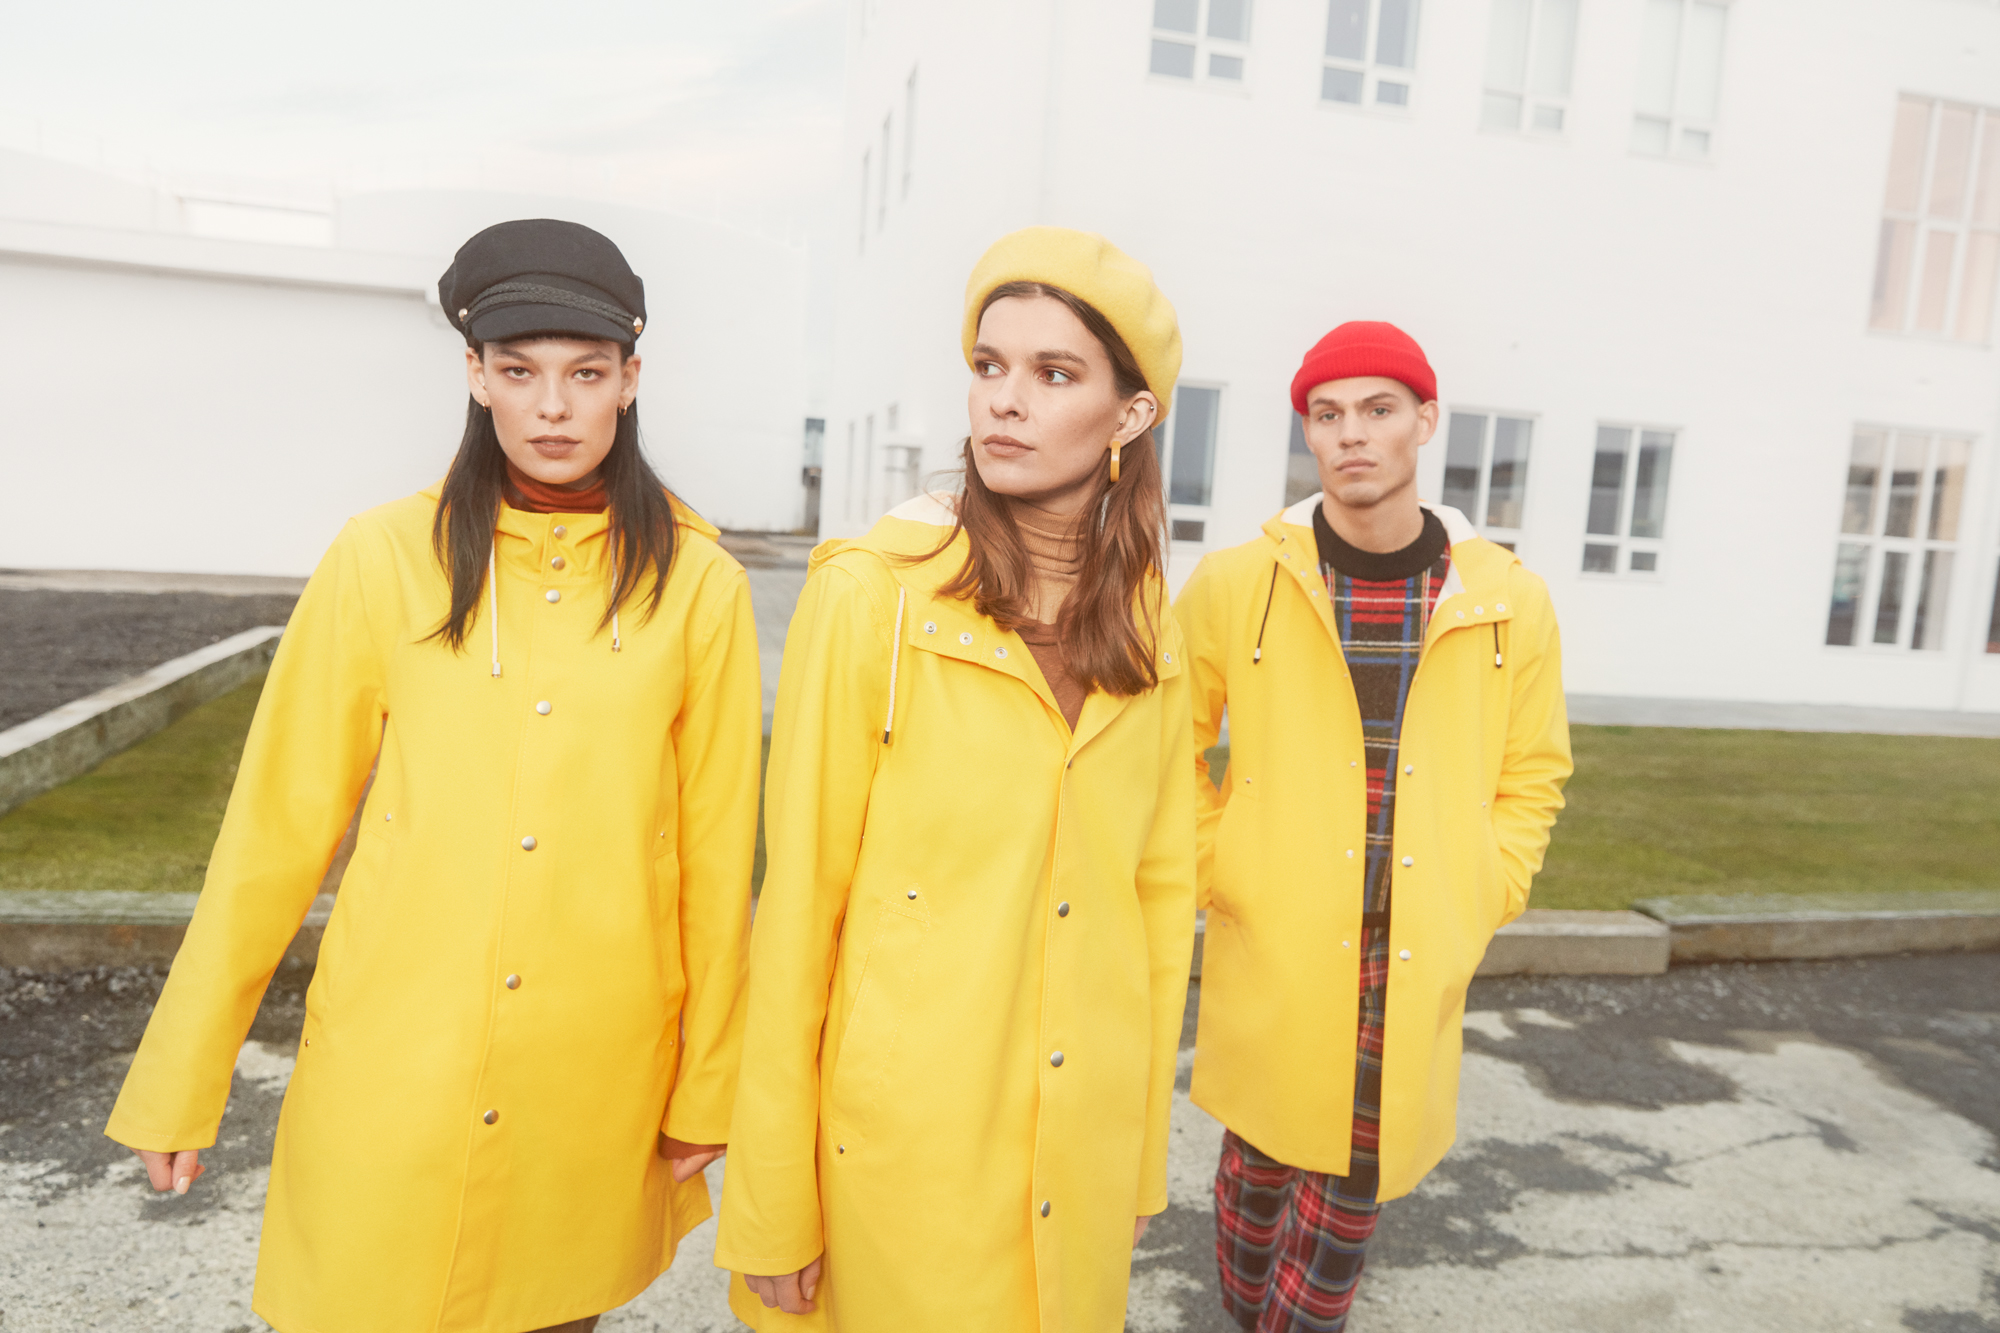 180930-Reykjavik-Raincoats-Campaign-03-448.jpg